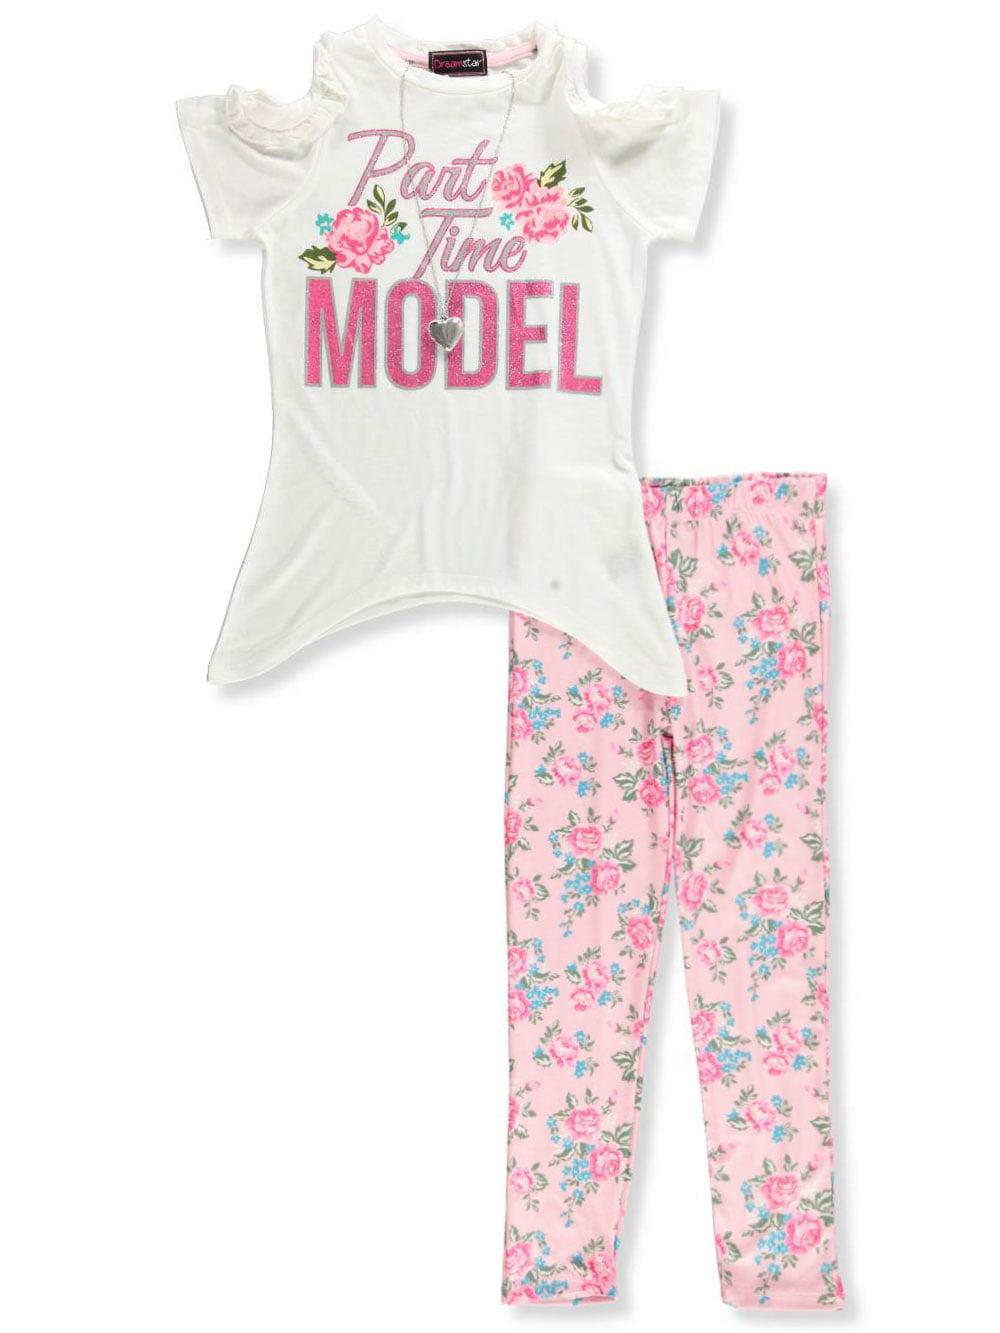 Dream Star Girls 2-Piece Leggings Set Outfit